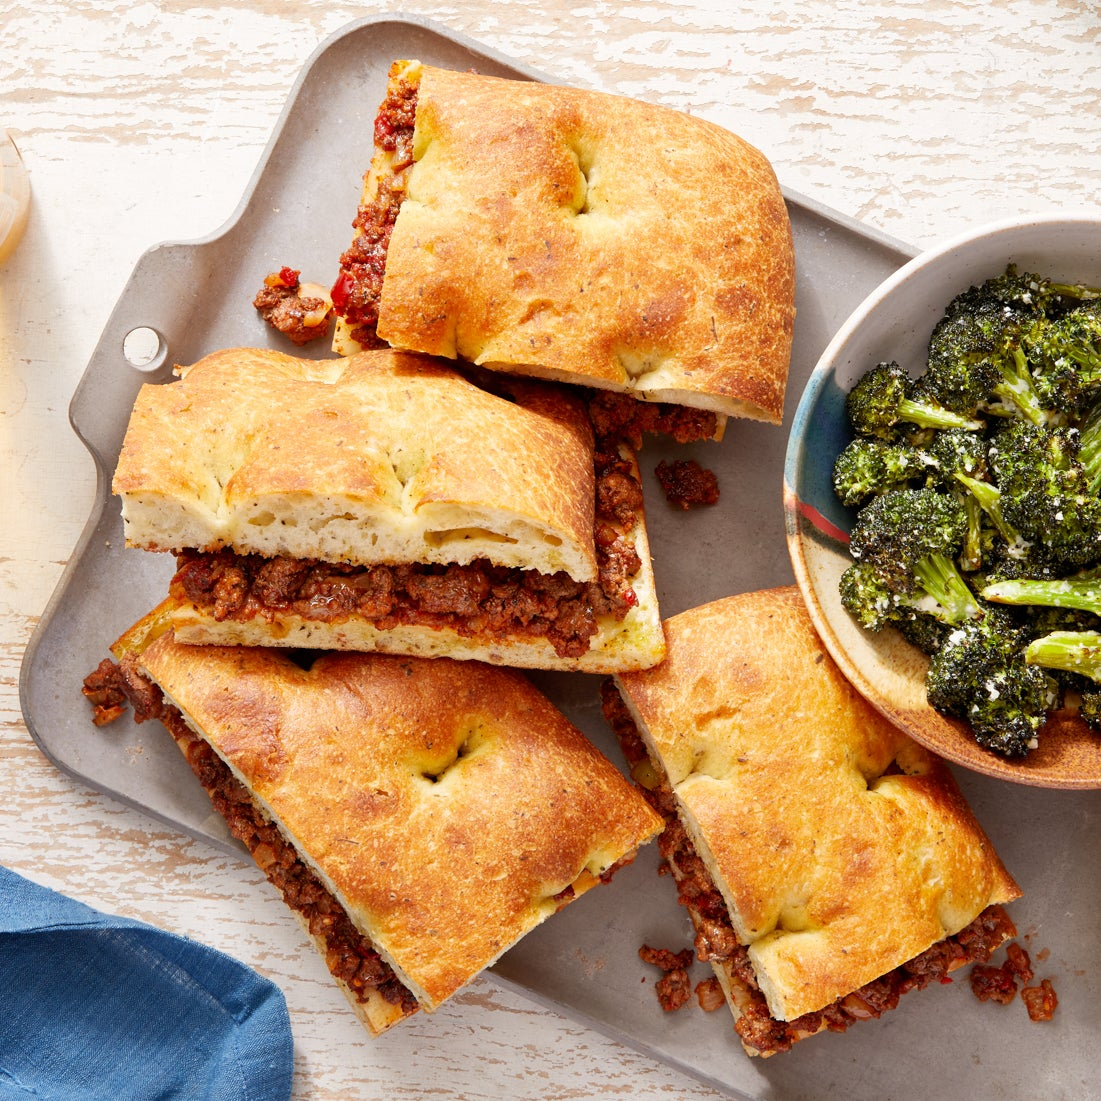 Italian Beef & Fontina Sandwiches with Caesar-Dressed Broccoli